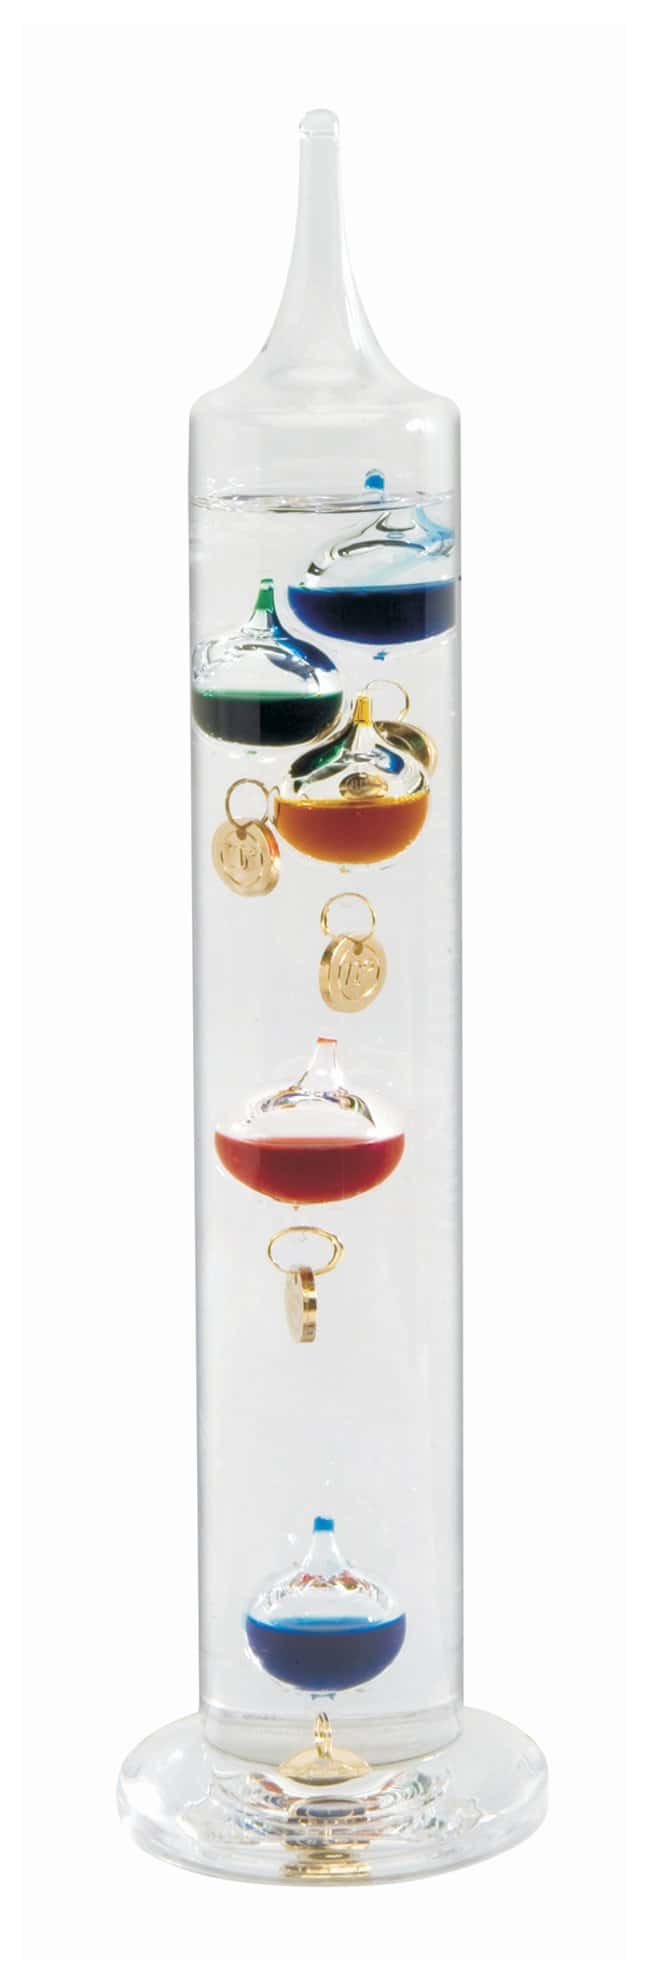 H-B Instrument™Galileo Thermometer